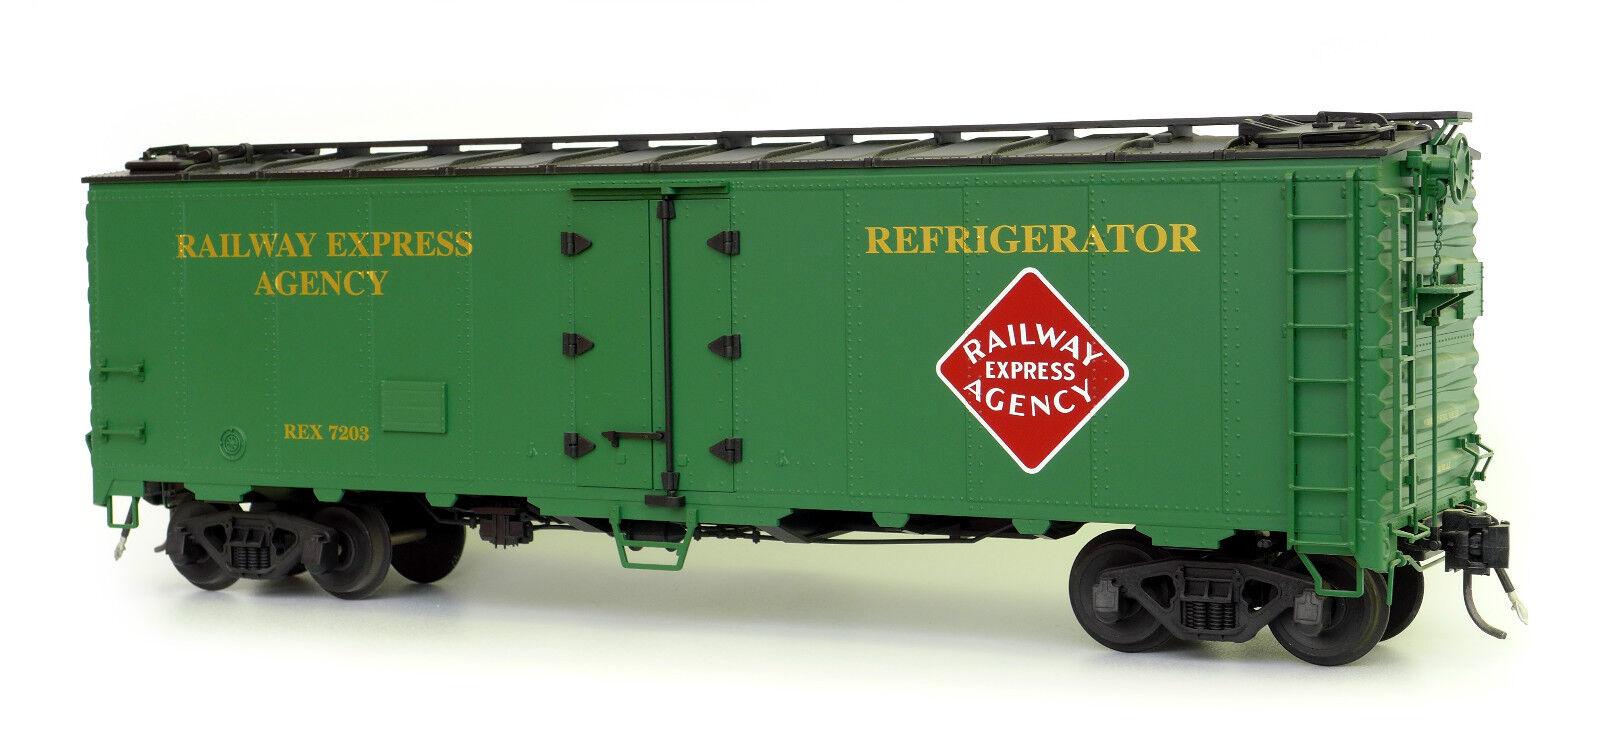 USA Trains r16508 Rea 40 ft. refrigerator Car, Ultimate Series, 1:29 con Kadee